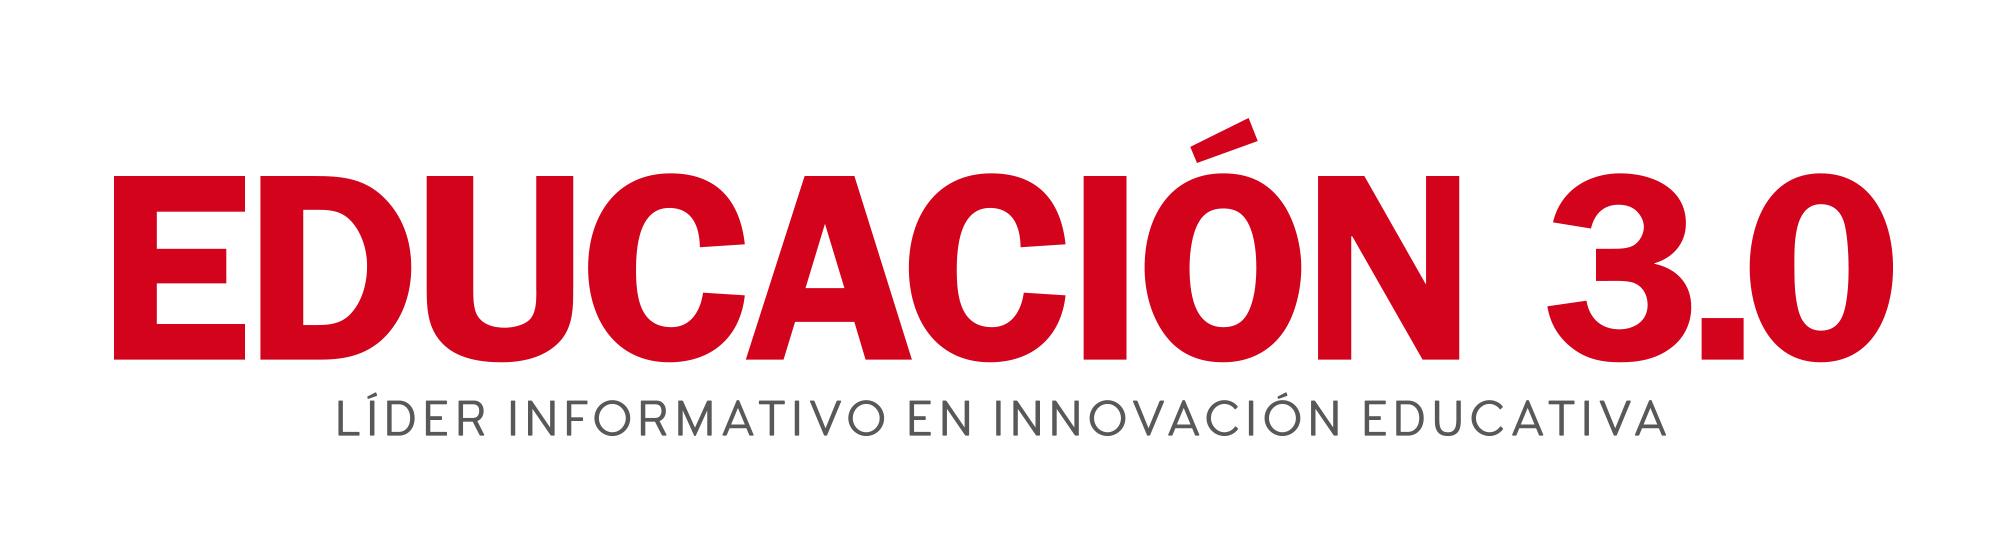 cabecera educacion 3.0 2017